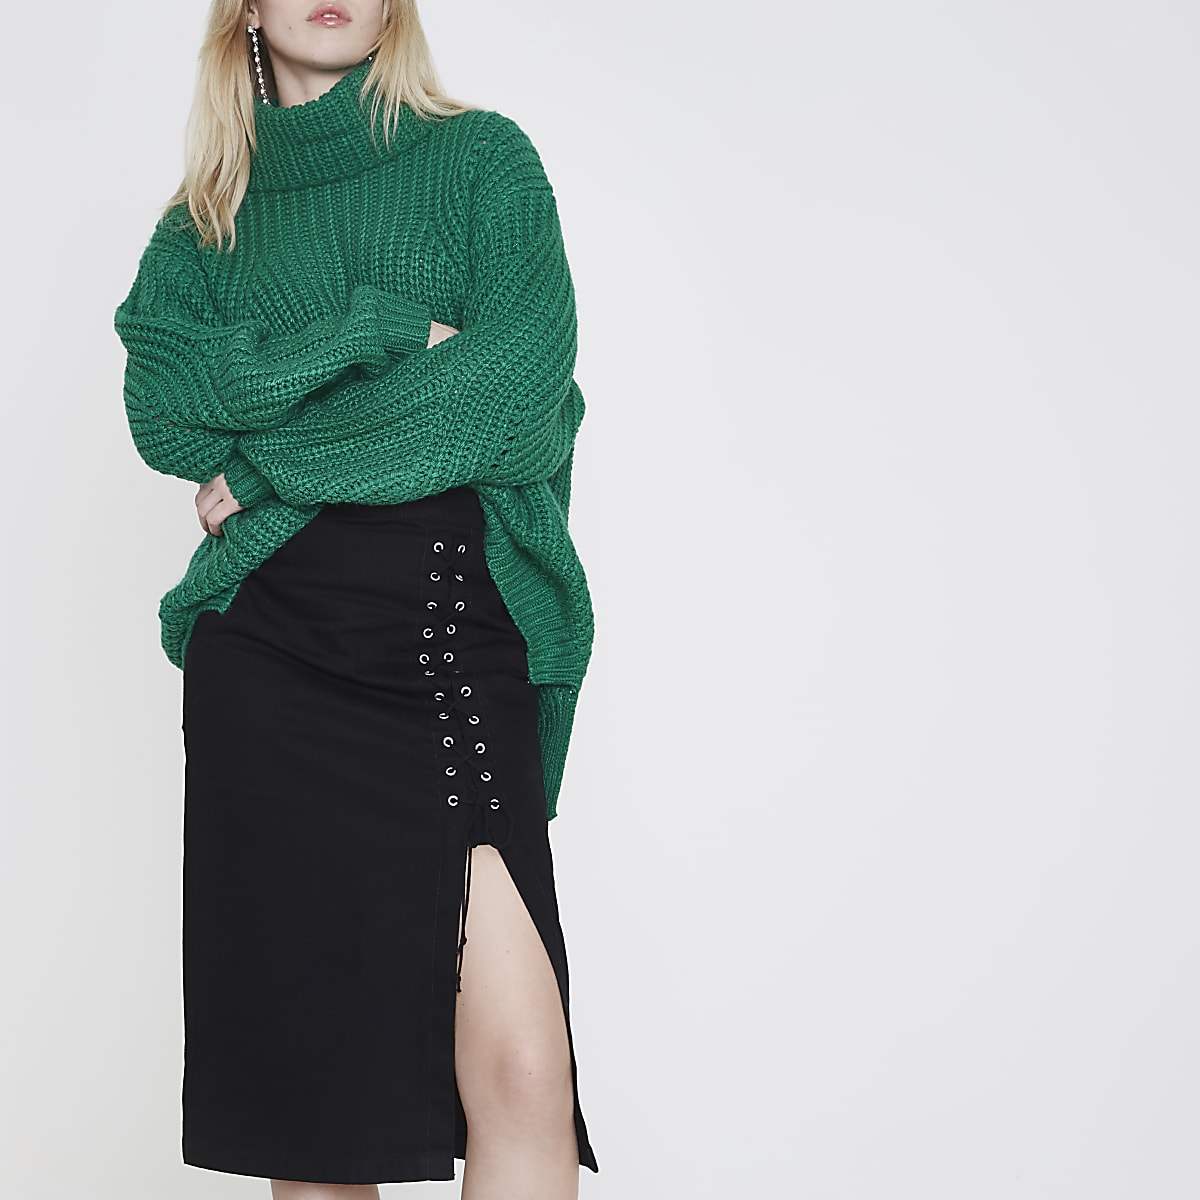 Black lace-up split denim pencil skirt